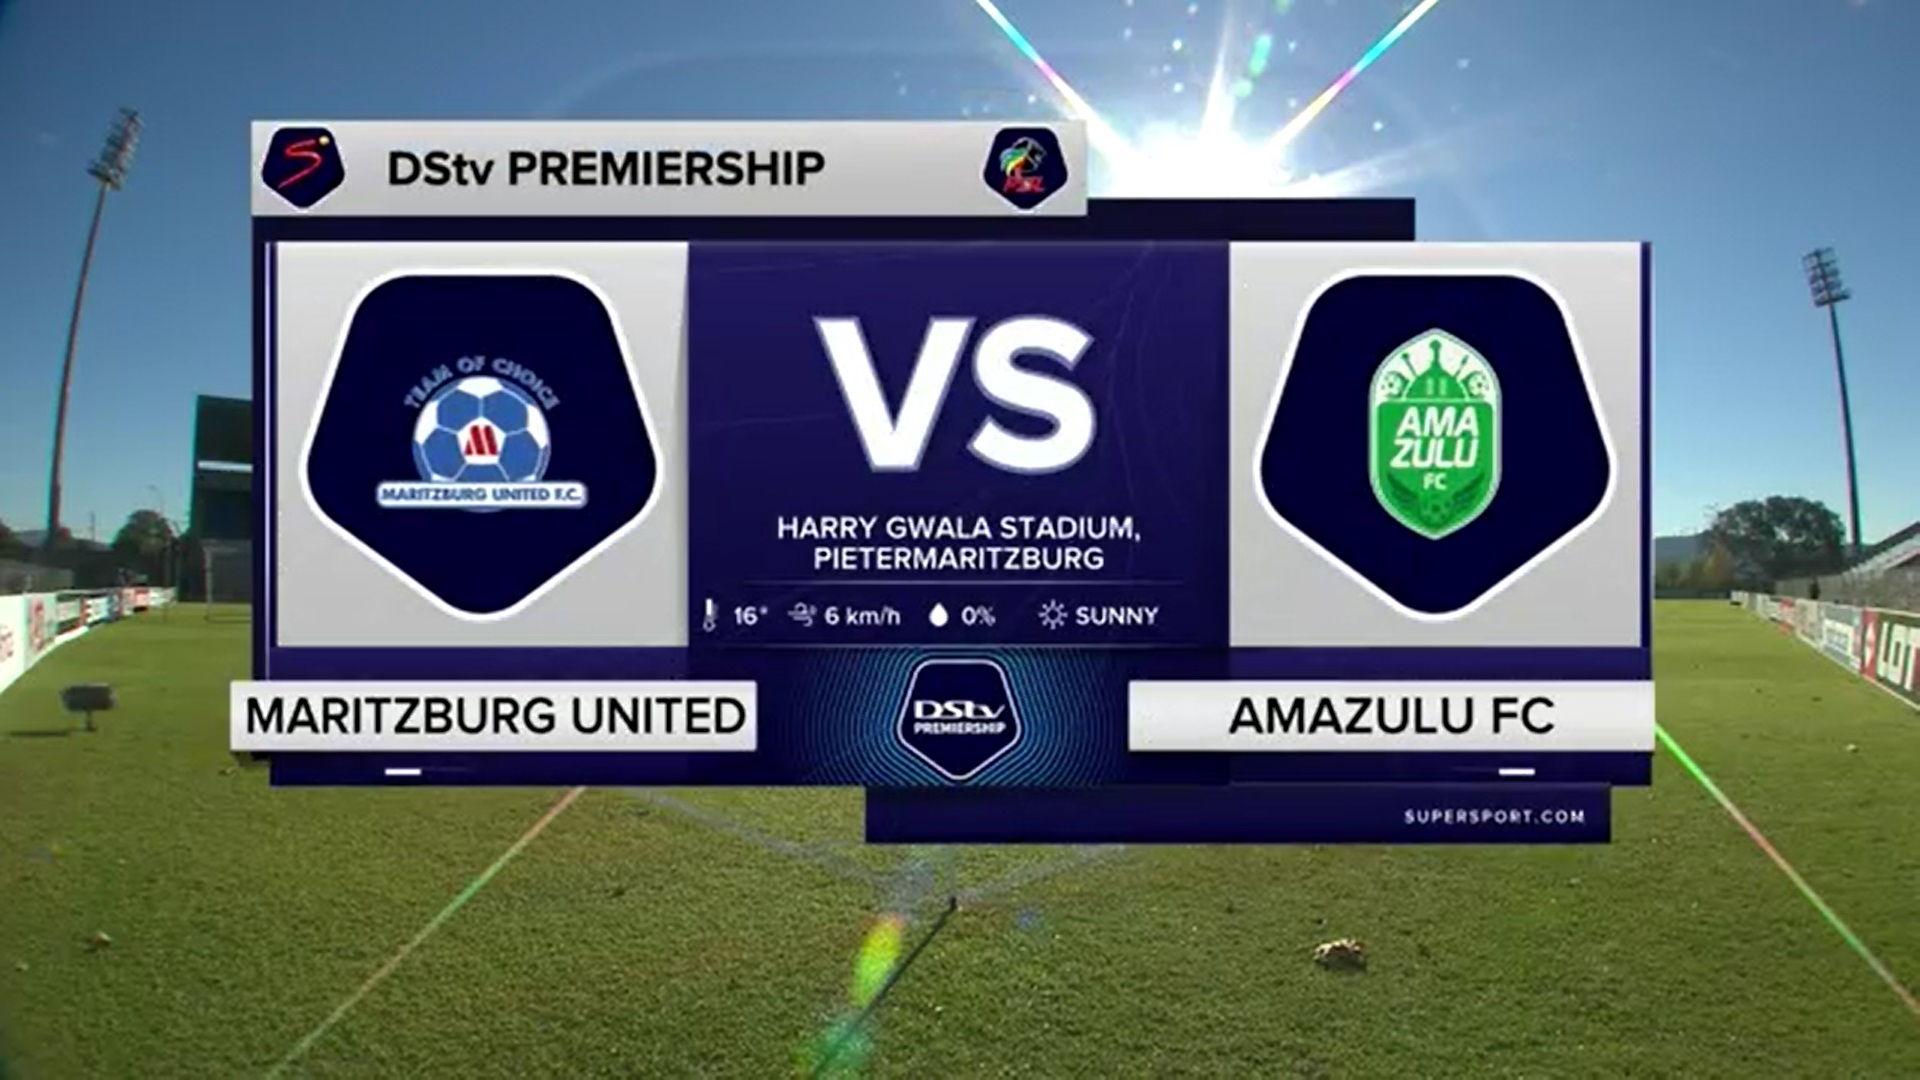 DStv Premiership | Maritzburg United v AmaZulu FC | Highlights